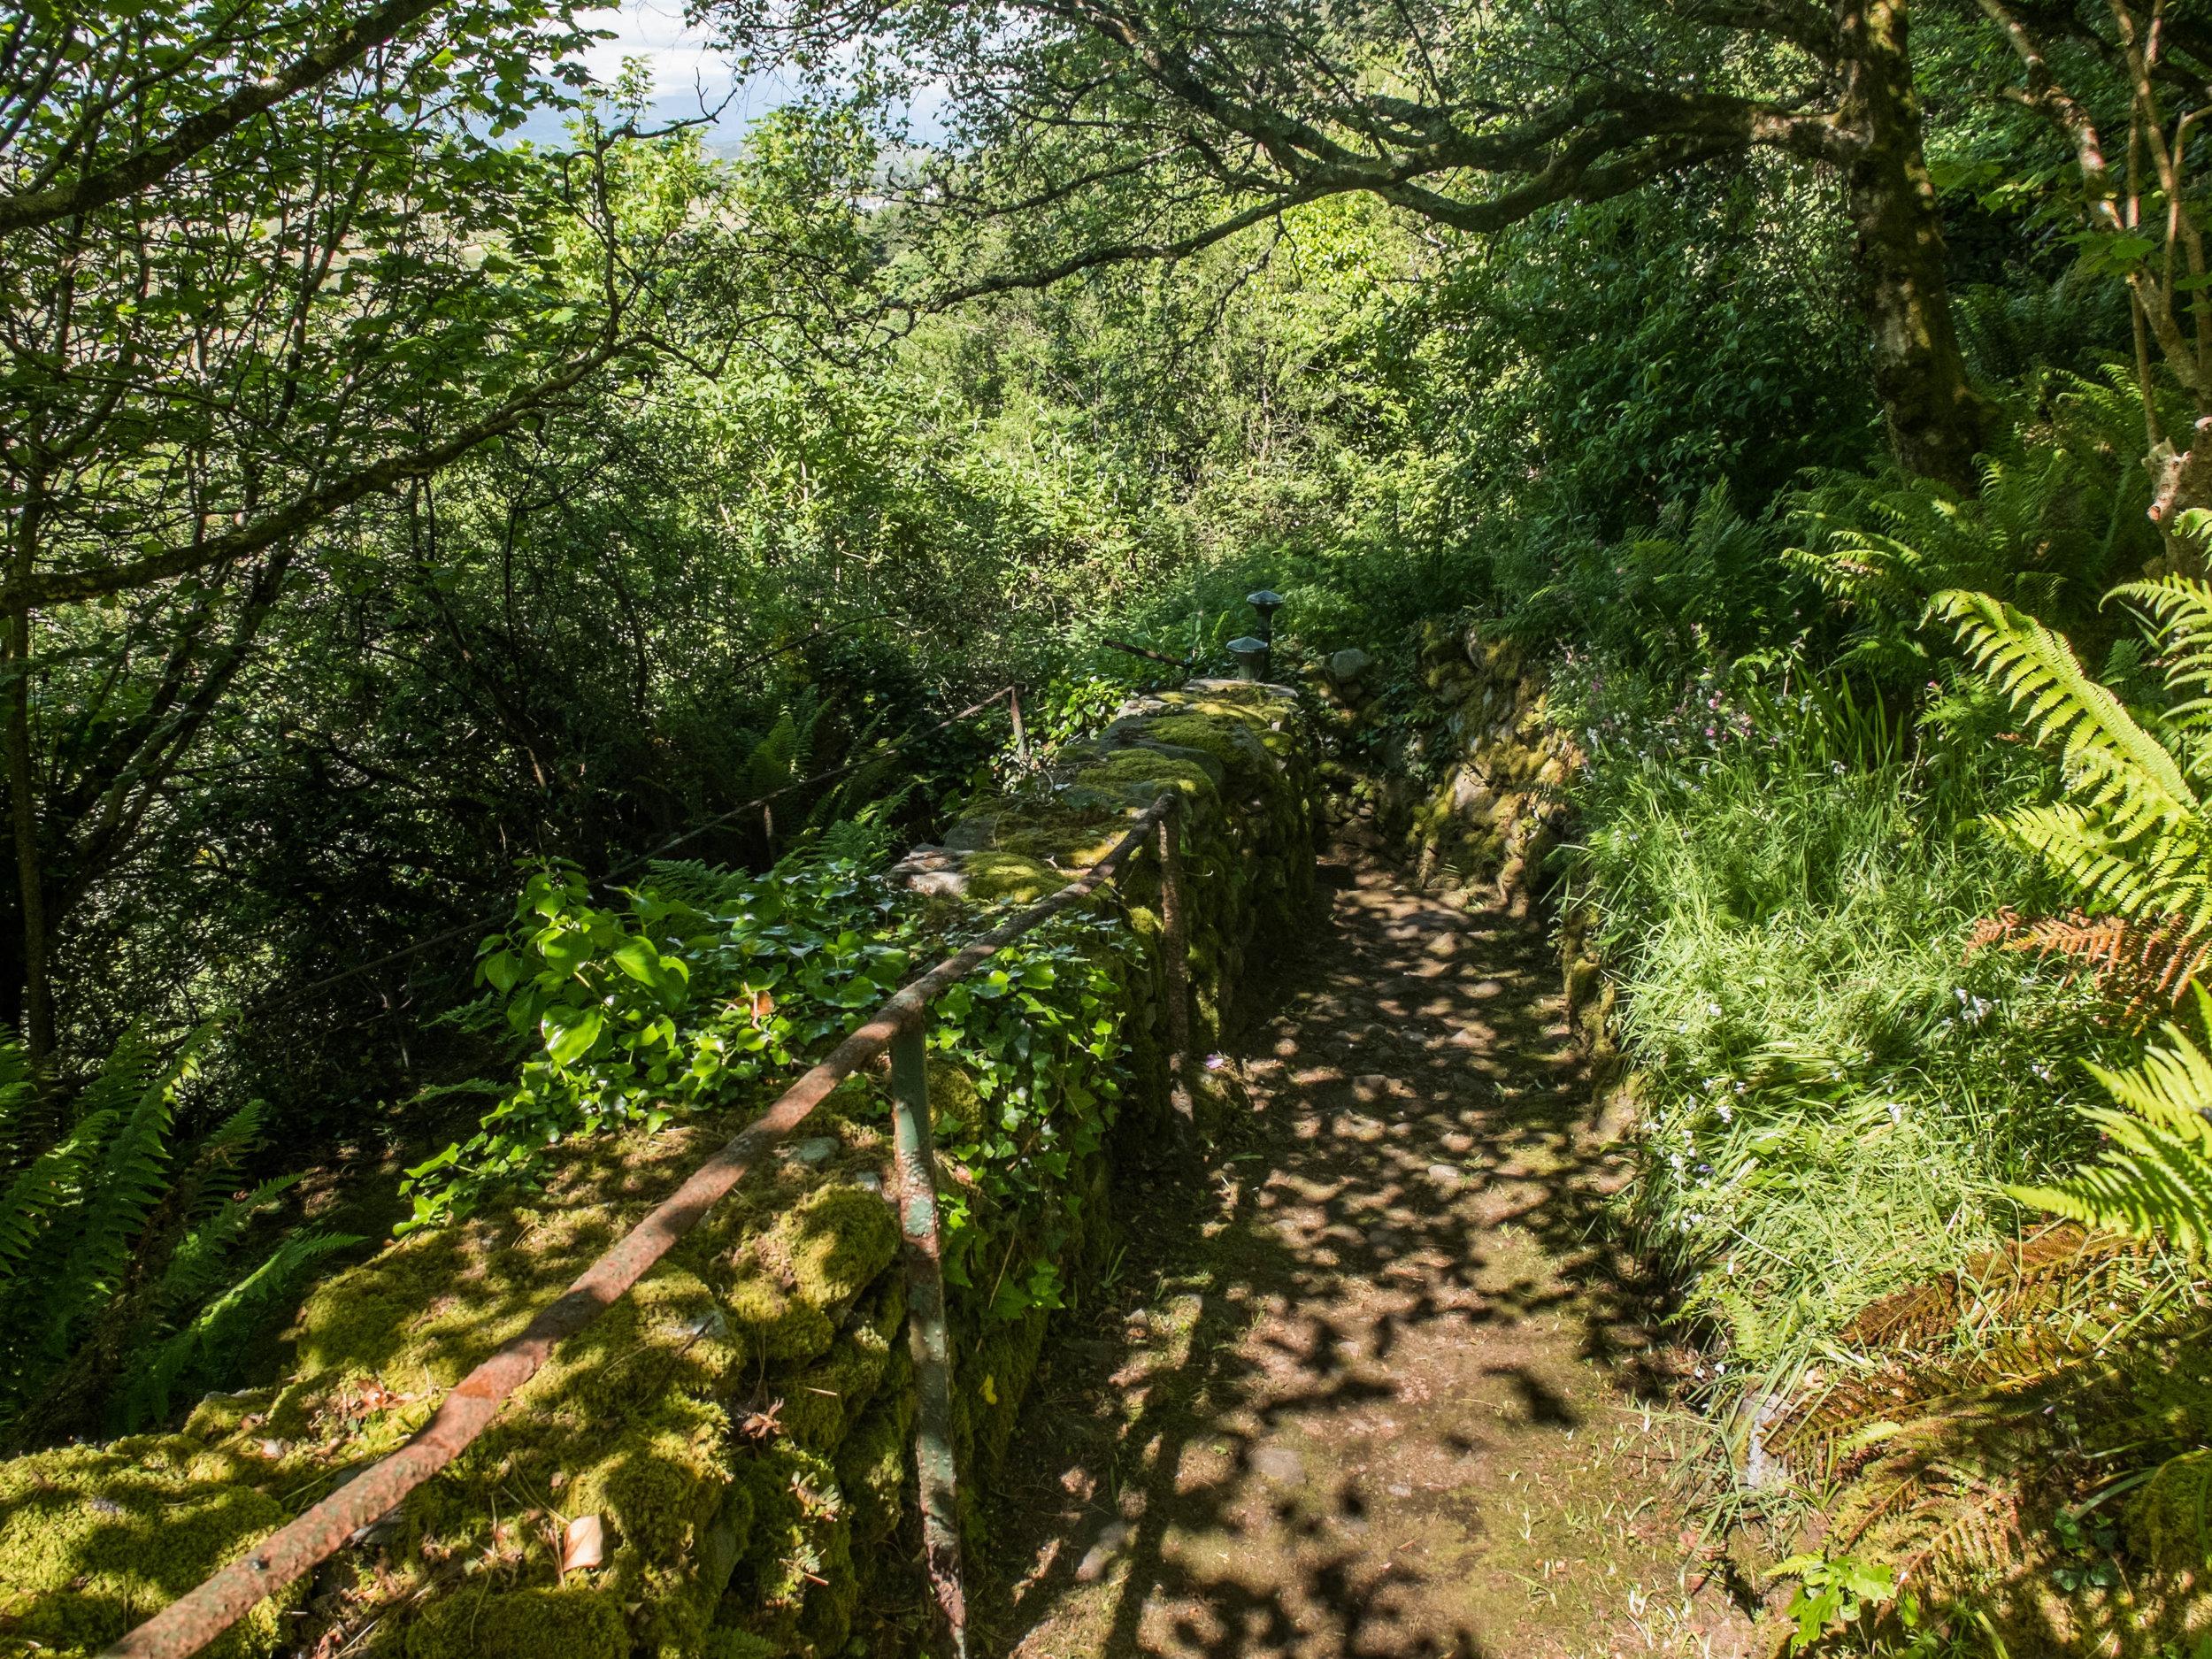 Private footpaths at Hafod Wen